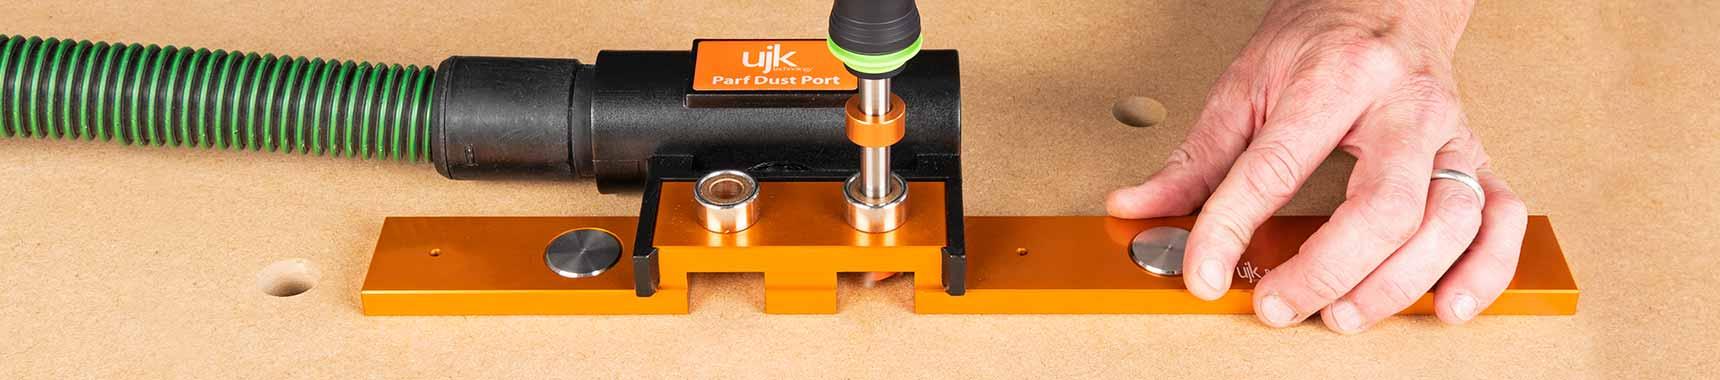 UJK Technology Parf Mk II Guide System